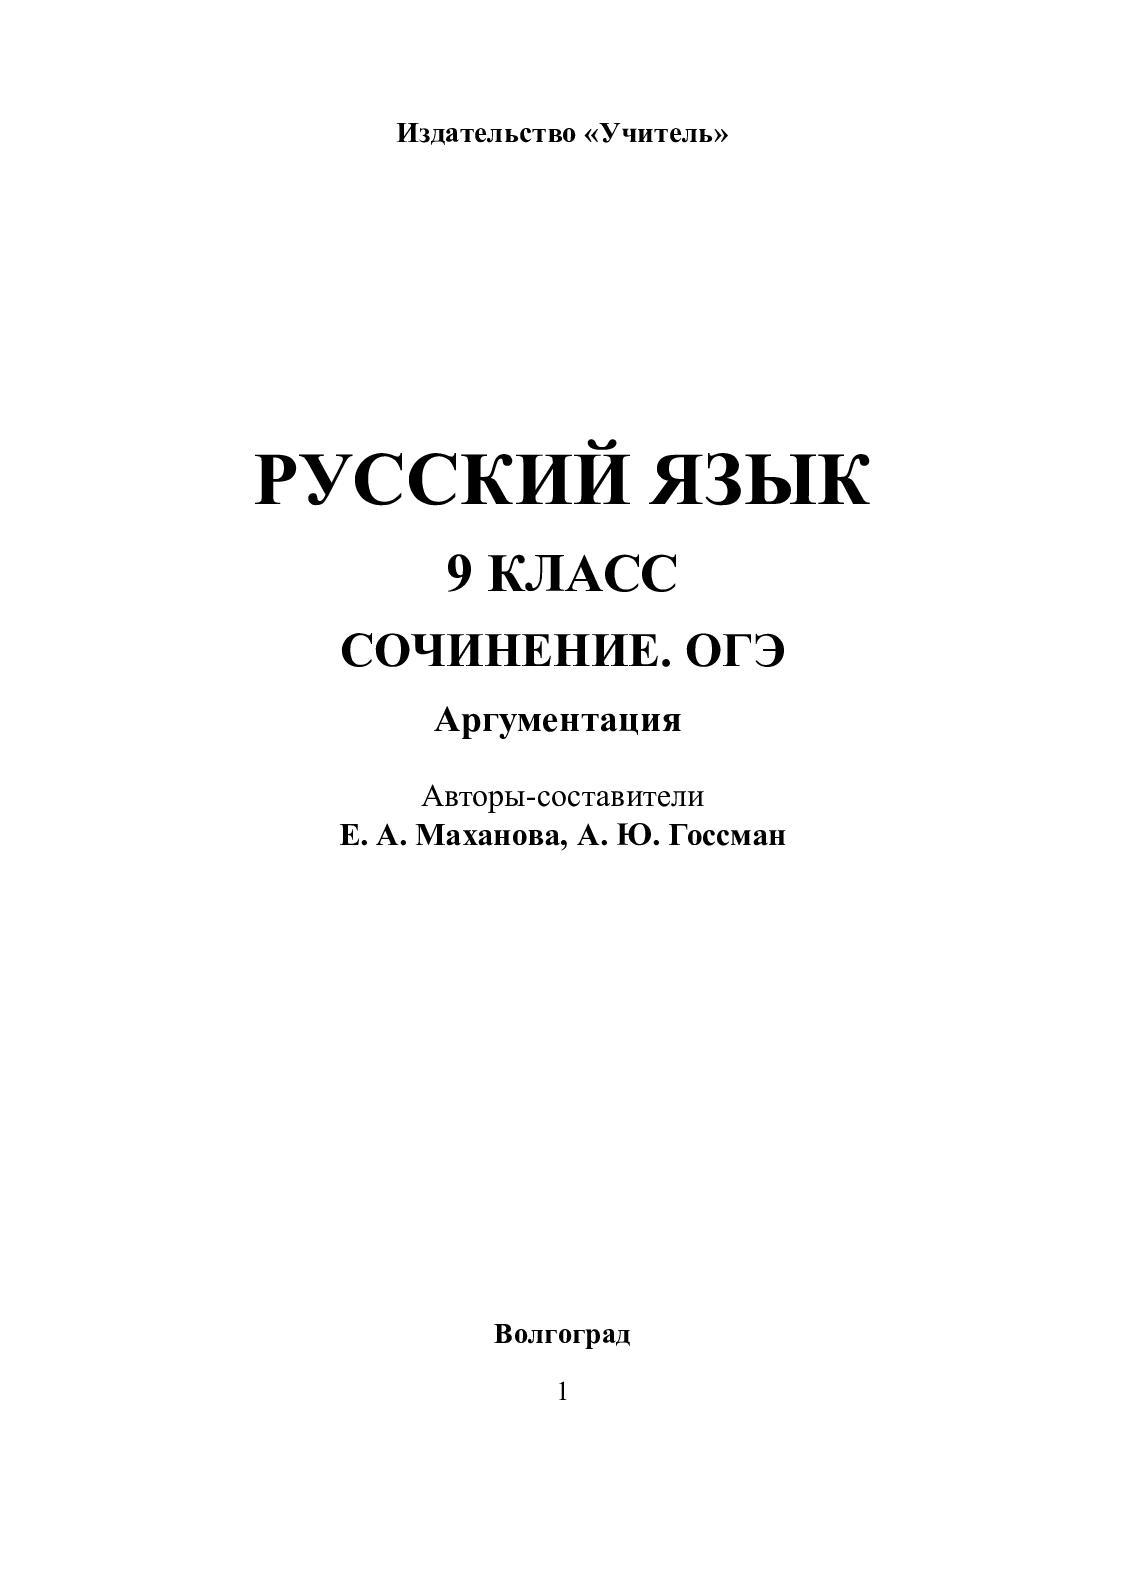 Быстрый займ на киви rsb24.ru